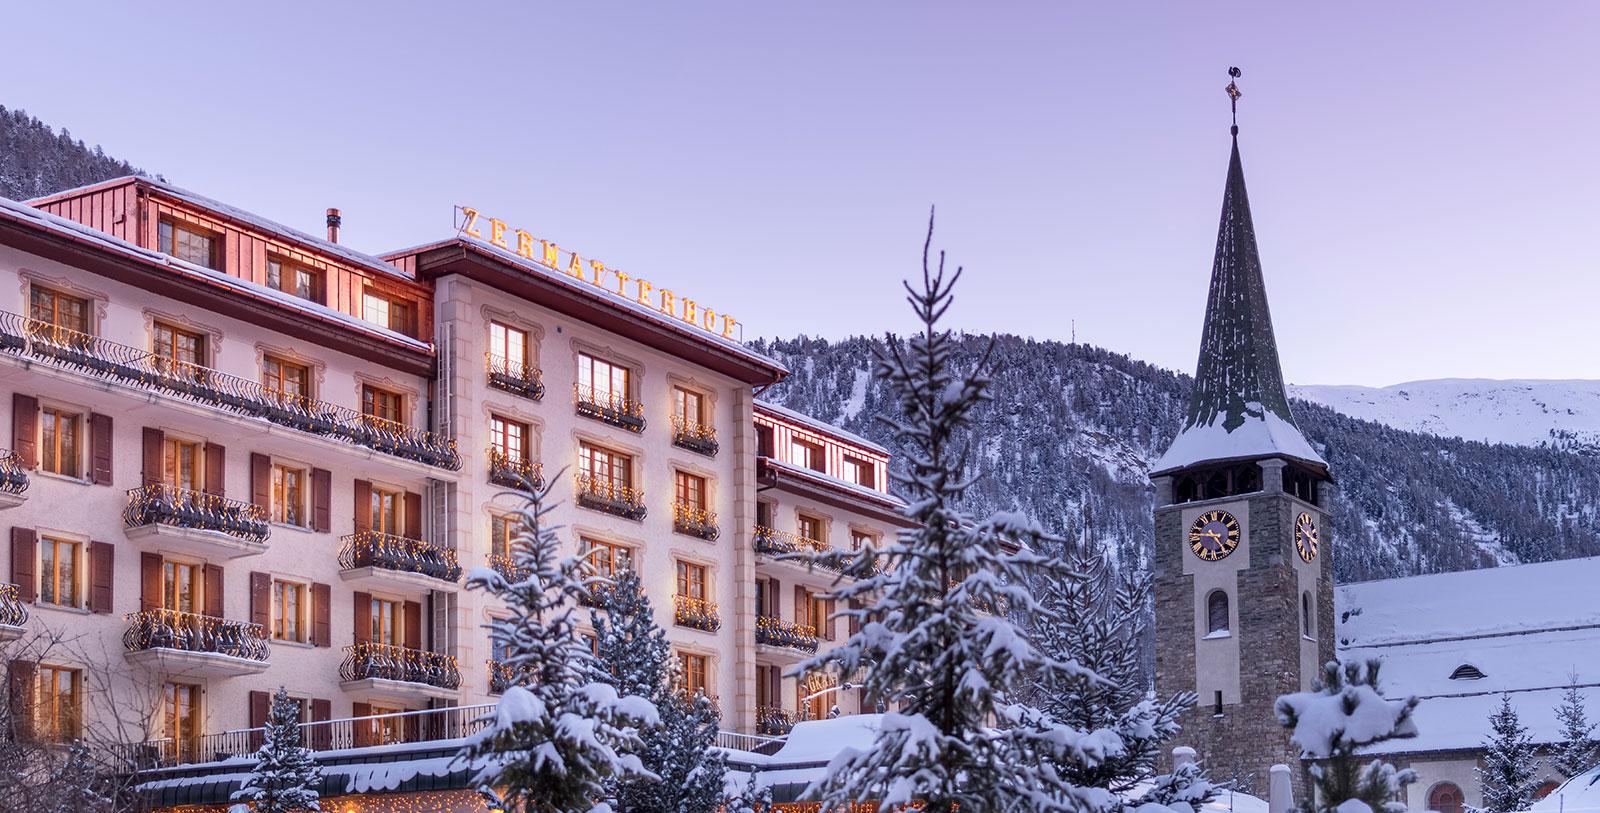 Image of Hotel Exterior, Grand Hotel Zermatterhof, 1879, Member of Historic Hotels Worldwide, Zermatt, Switzerland, Overview